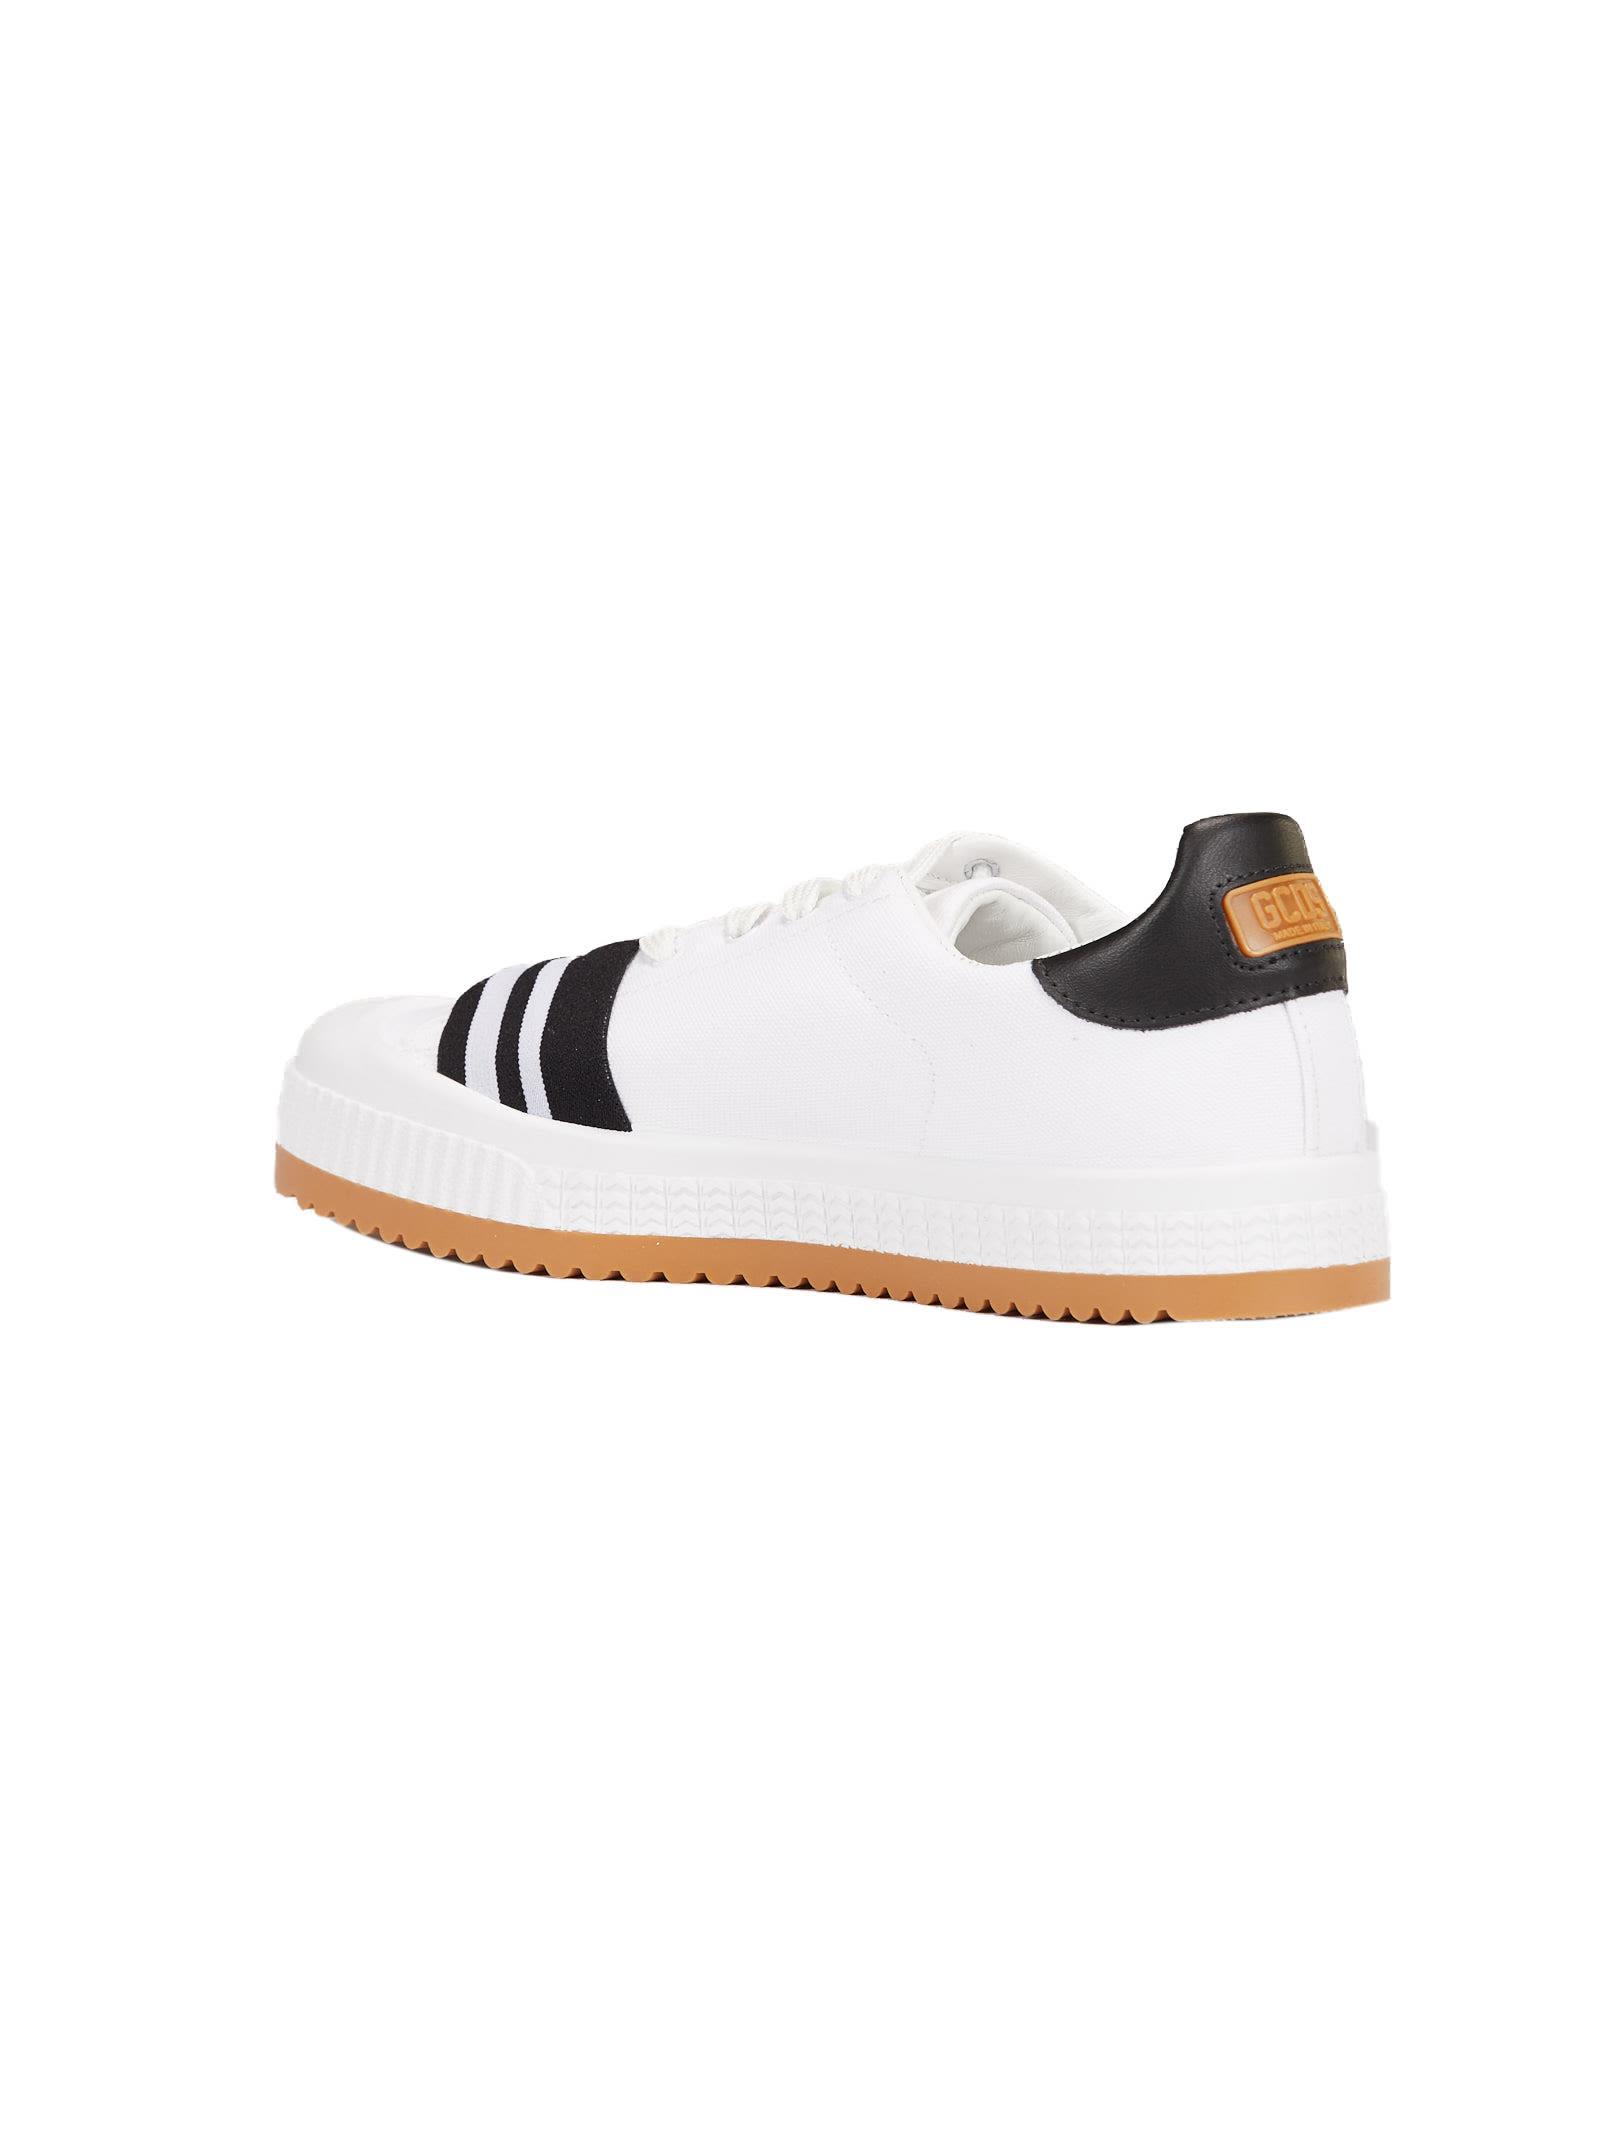 Gcds low band sneakers outlet new styles footlocker online professional sale online ffpLknUteP